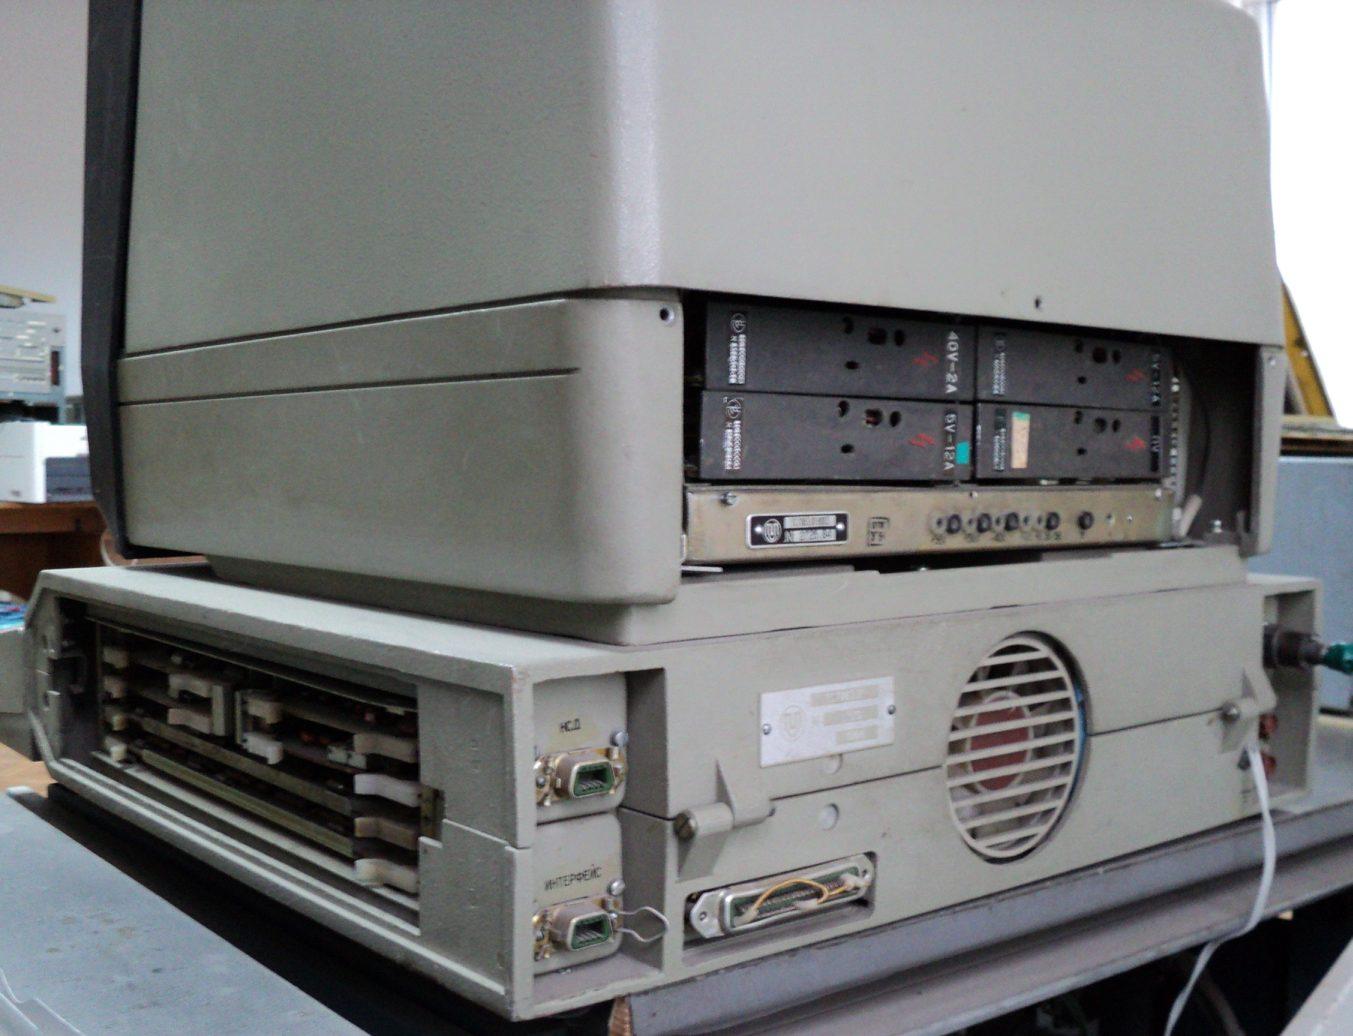 ТС-7063: Вспоминаем 80-е - 2